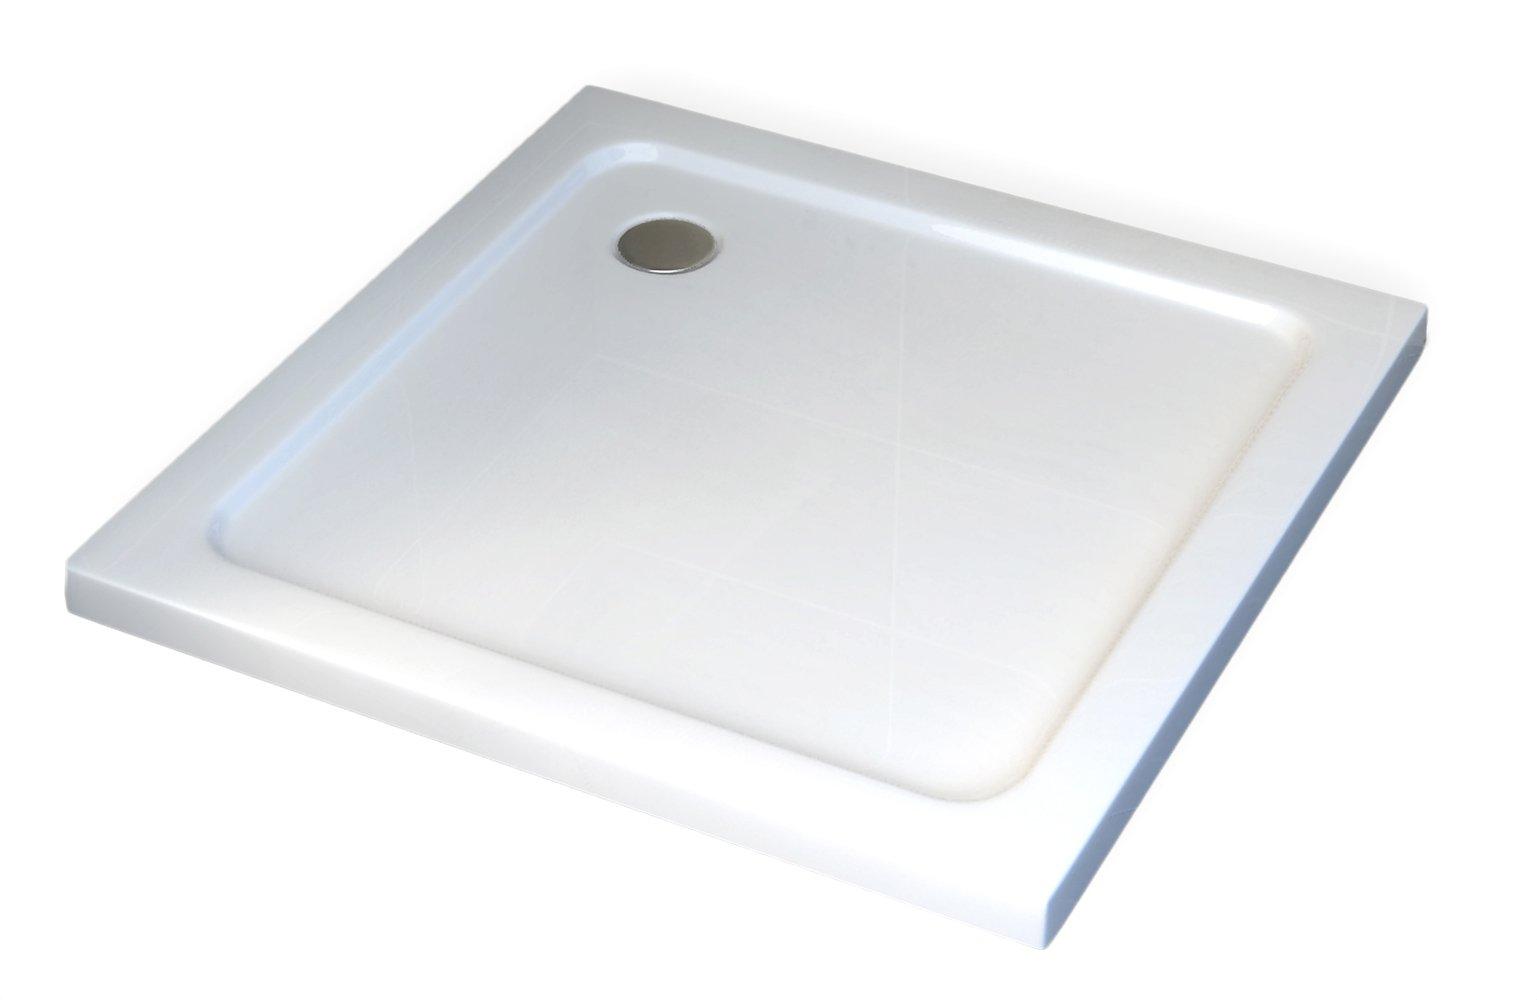 Duschtasse Duschwanne quadratisch - 90 x 90 cm inkl. Ablaufgarnitur zoom thumbnail 4